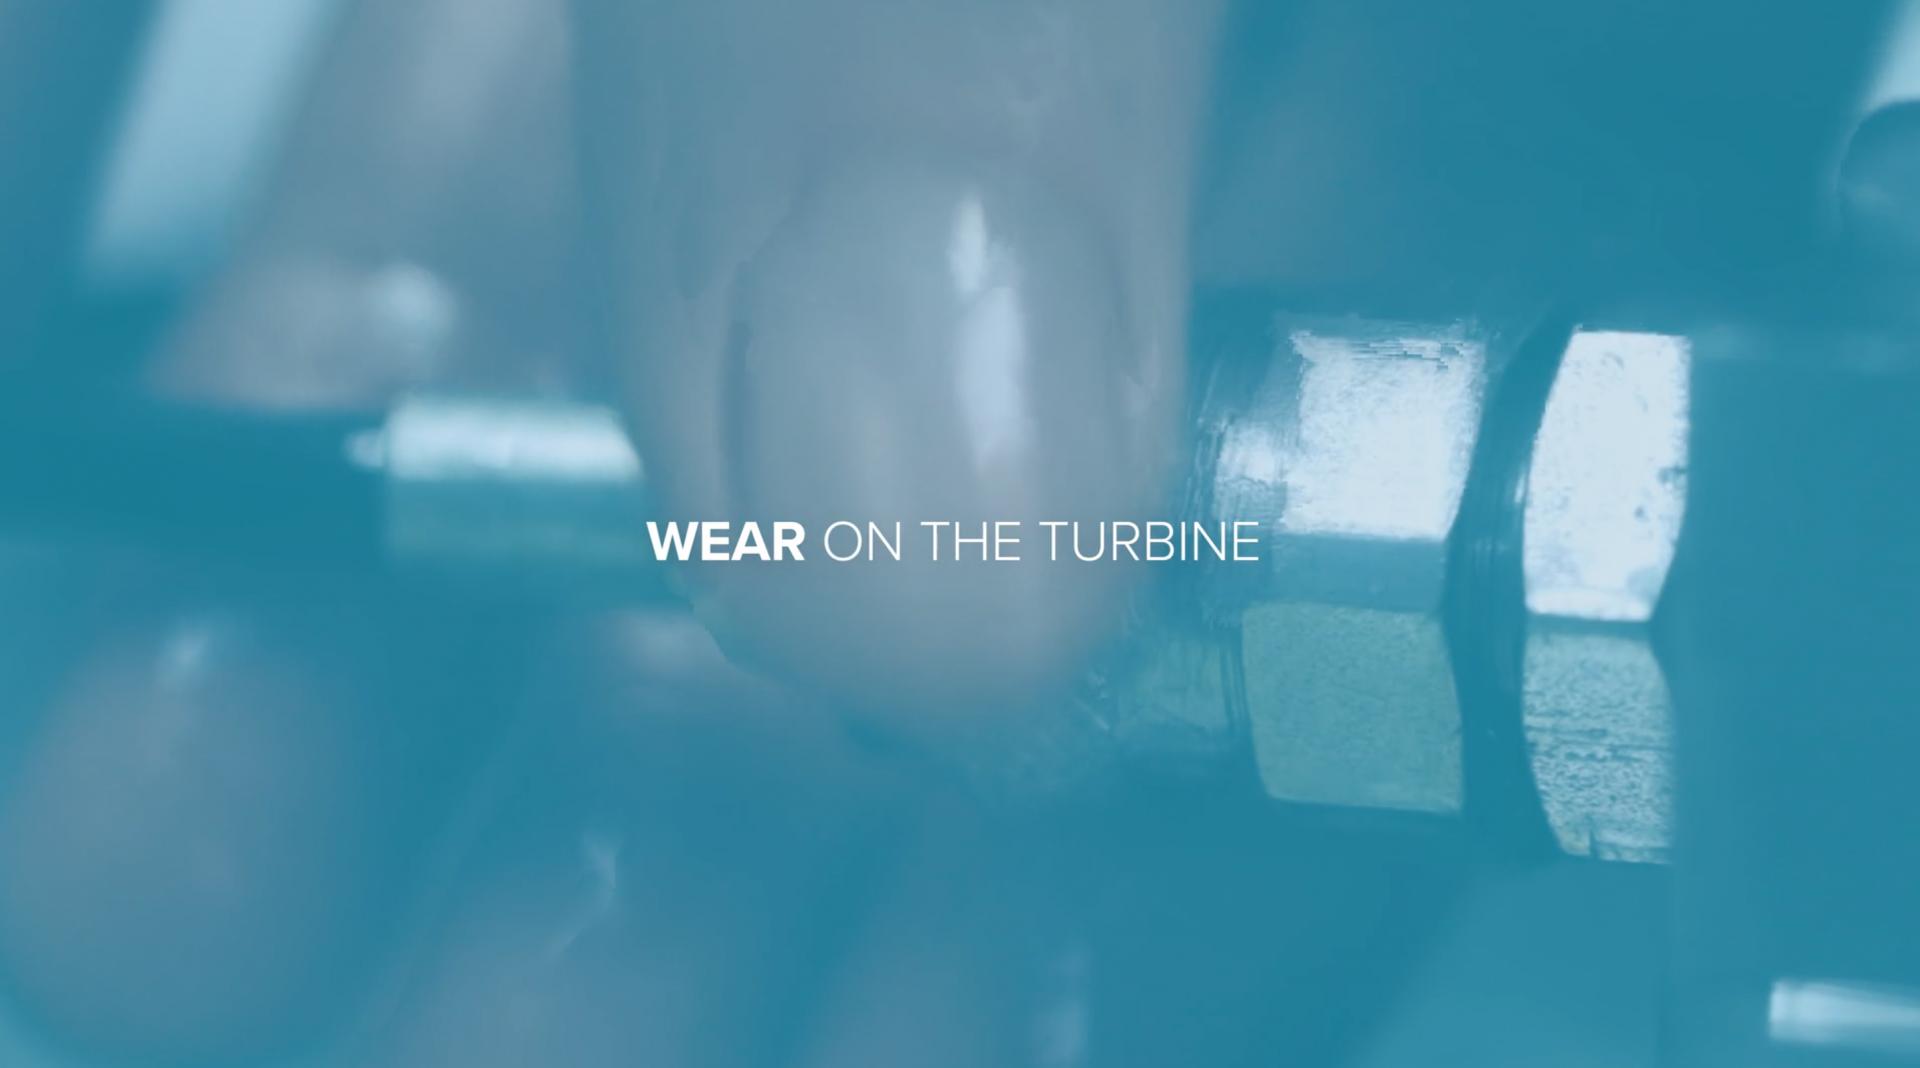 Wear on the Turbine